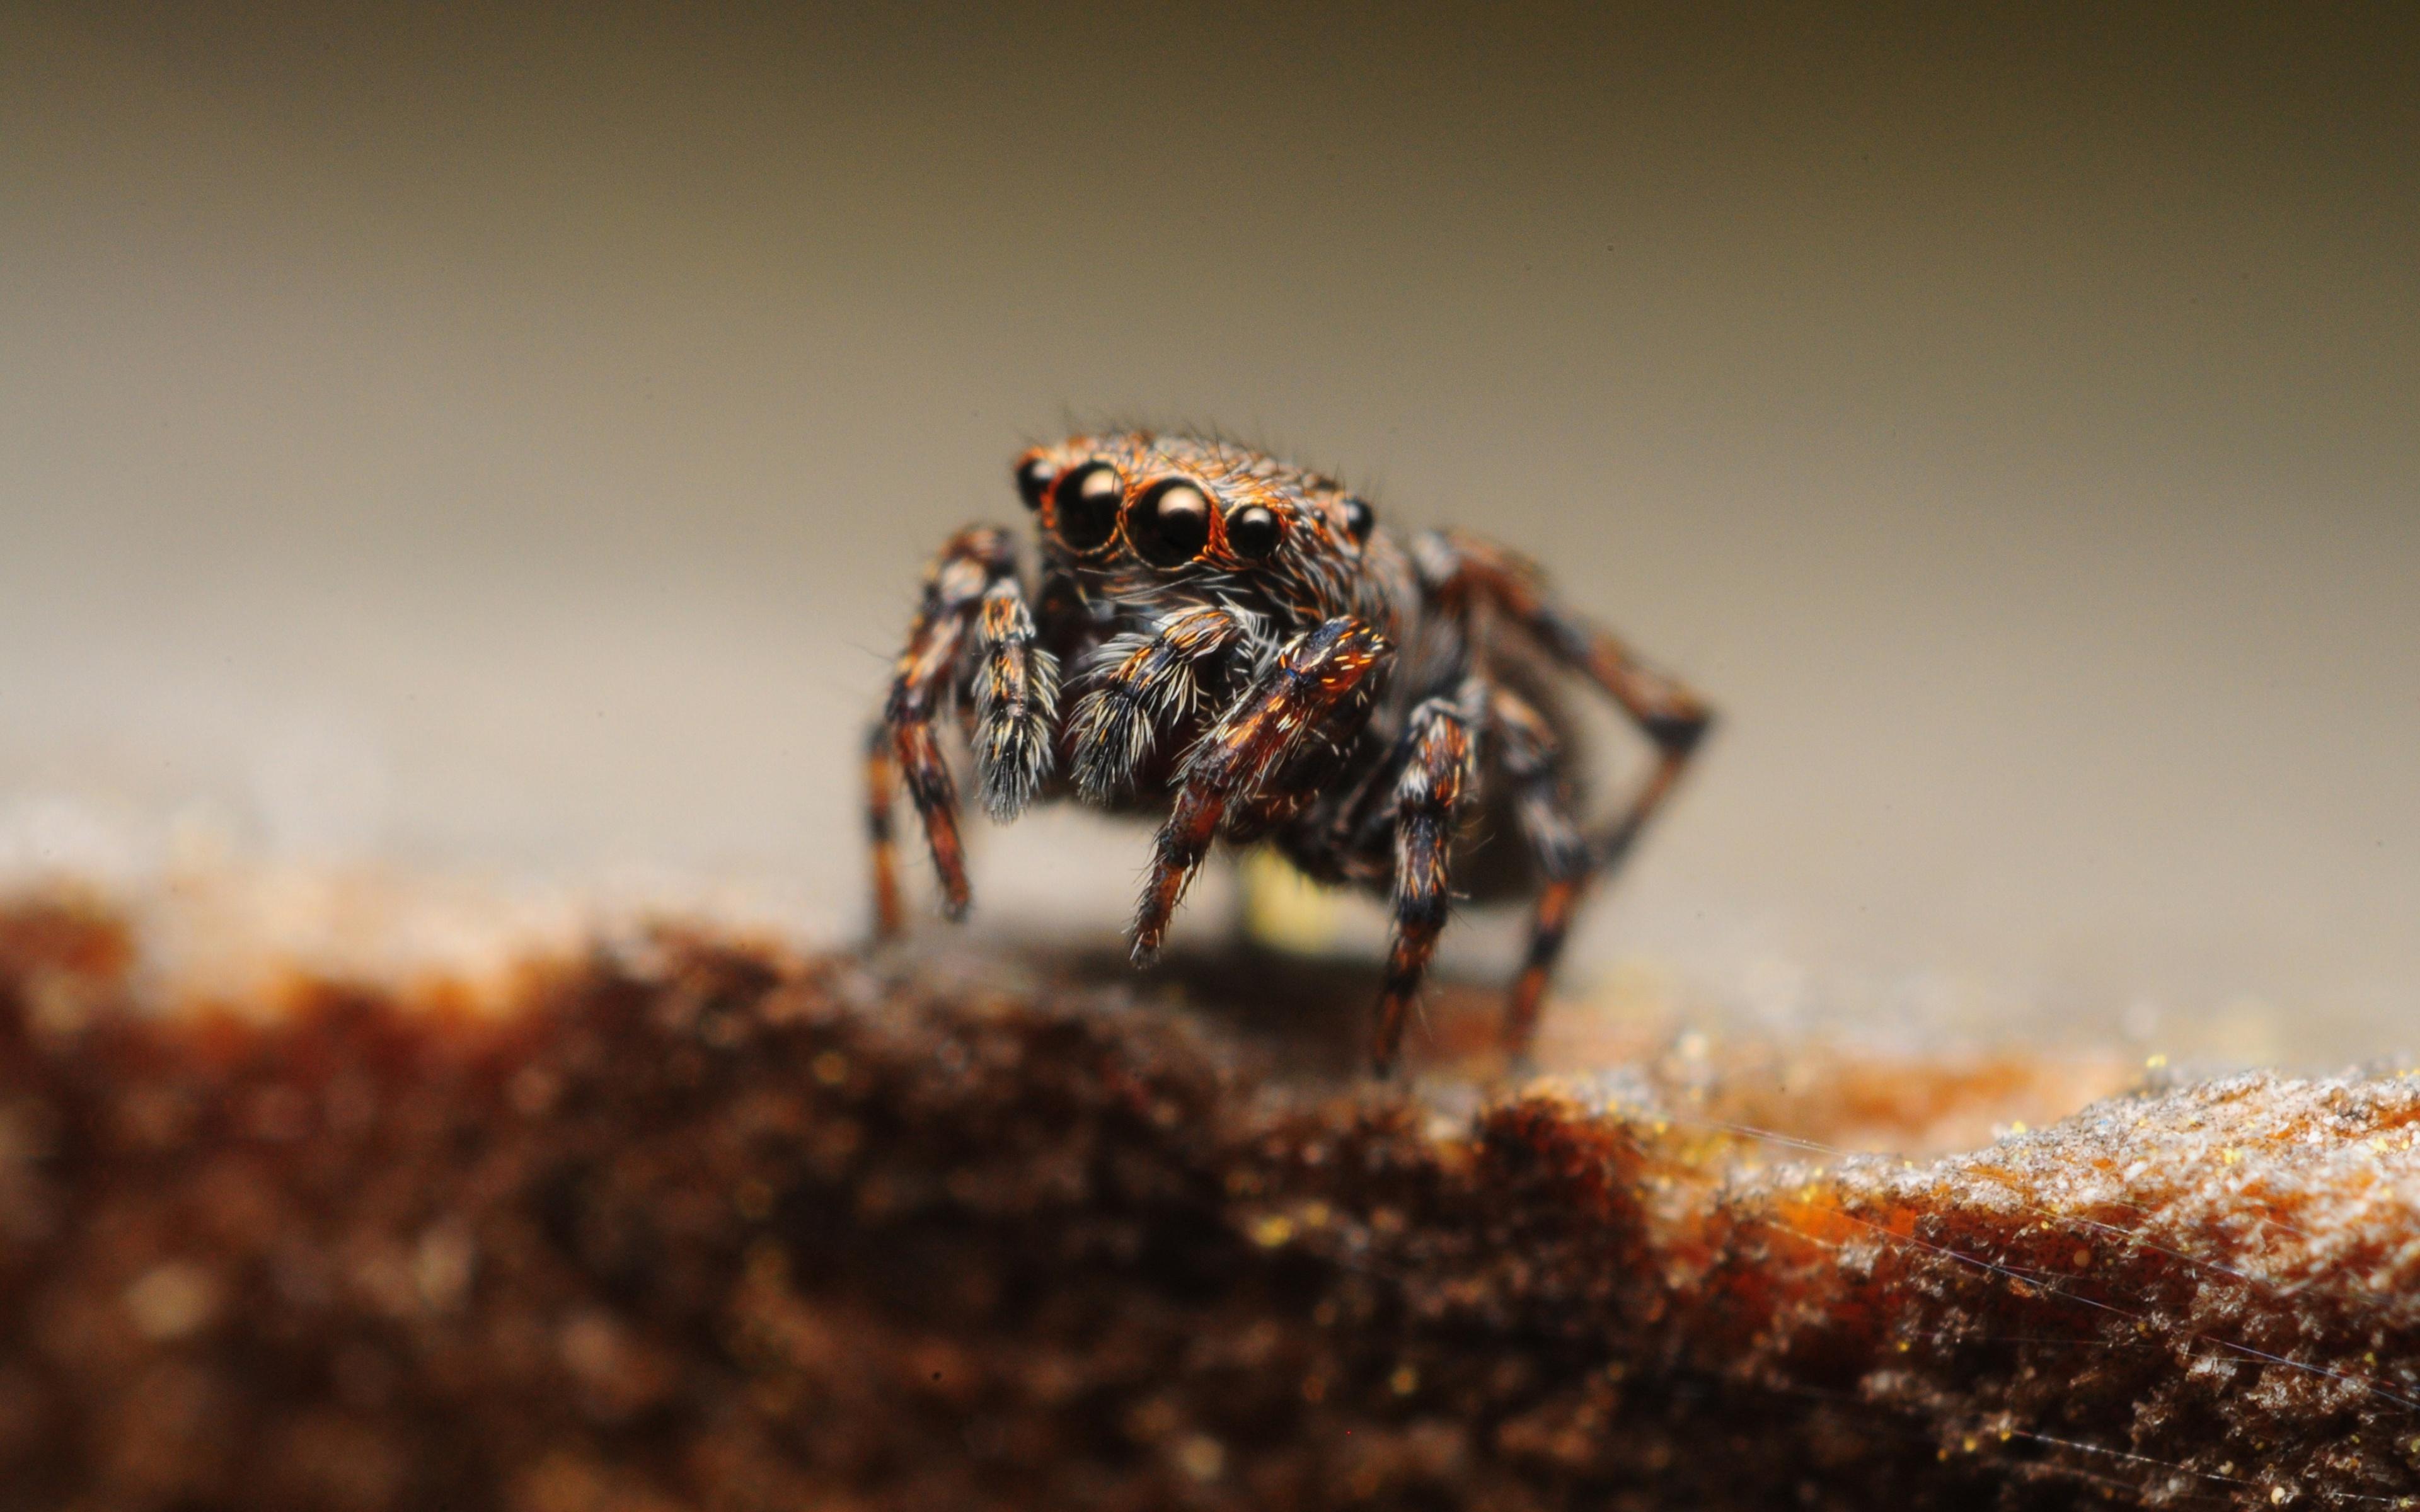 природа животные паук  № 2544238 без смс